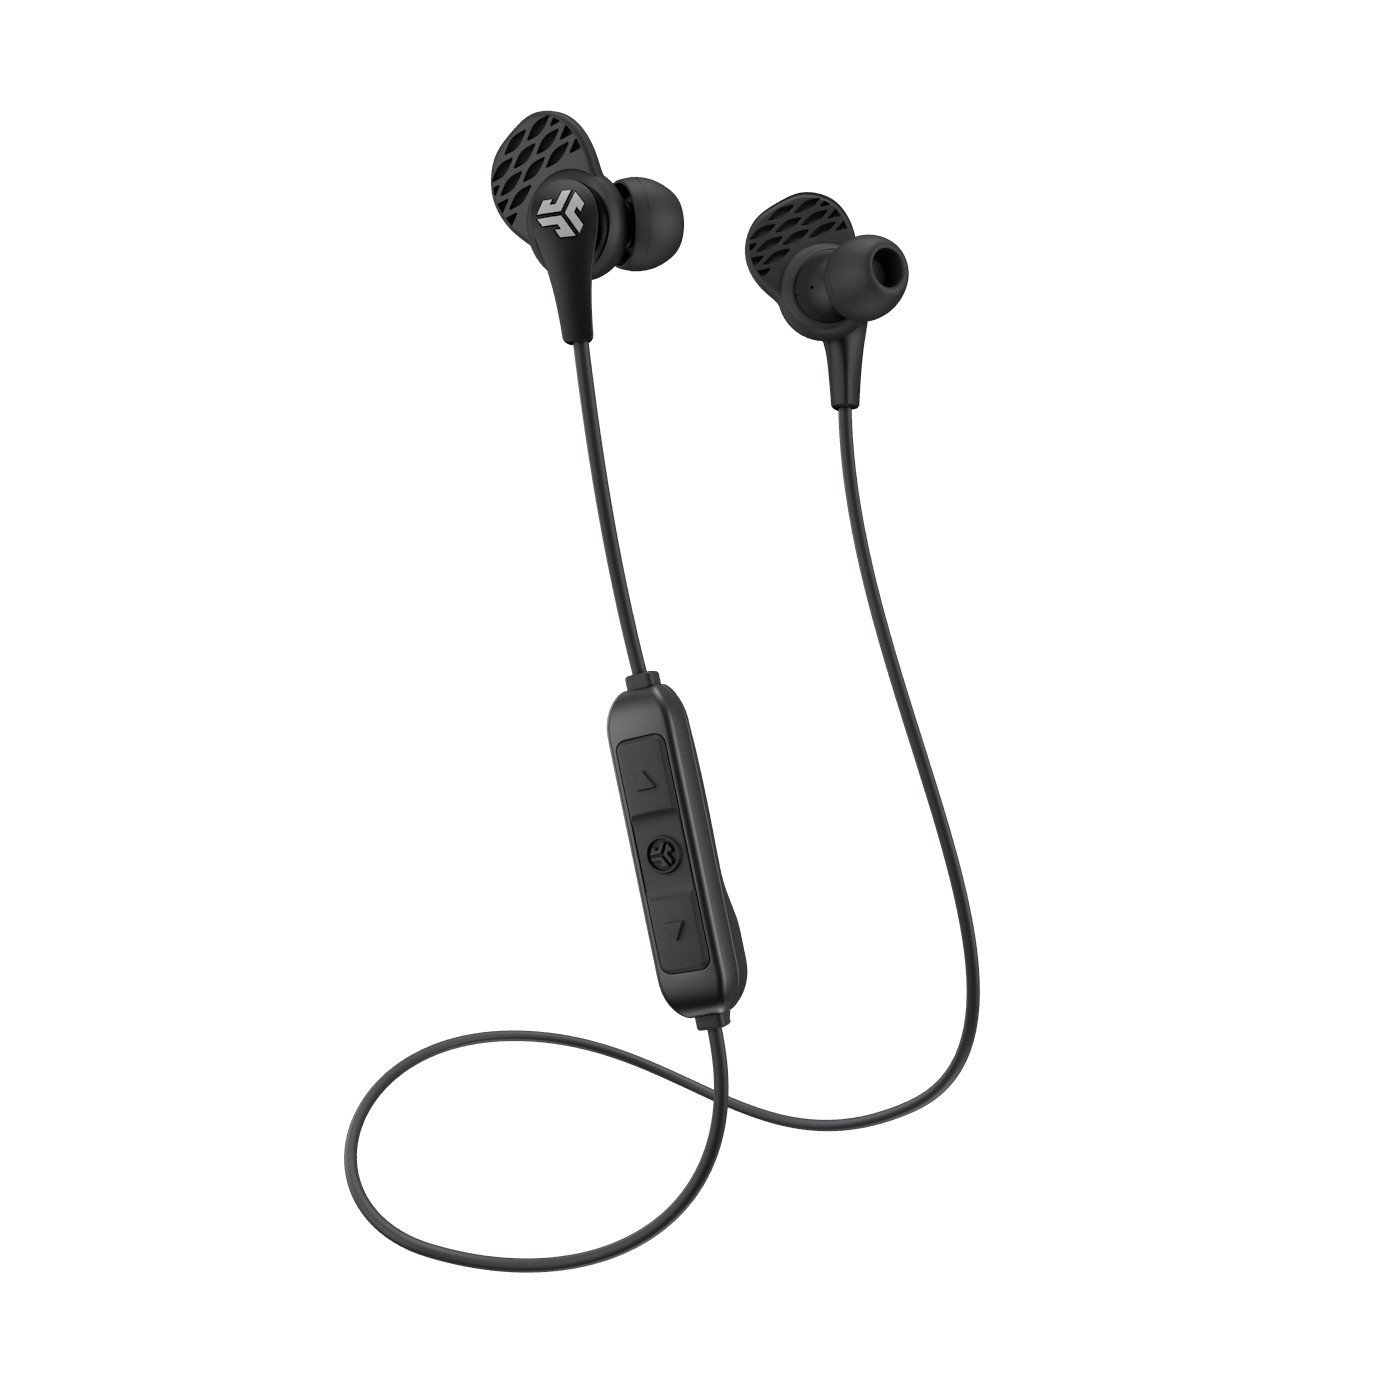 JLab Audio JBuds Pro Wireless Signature Earbuds Black